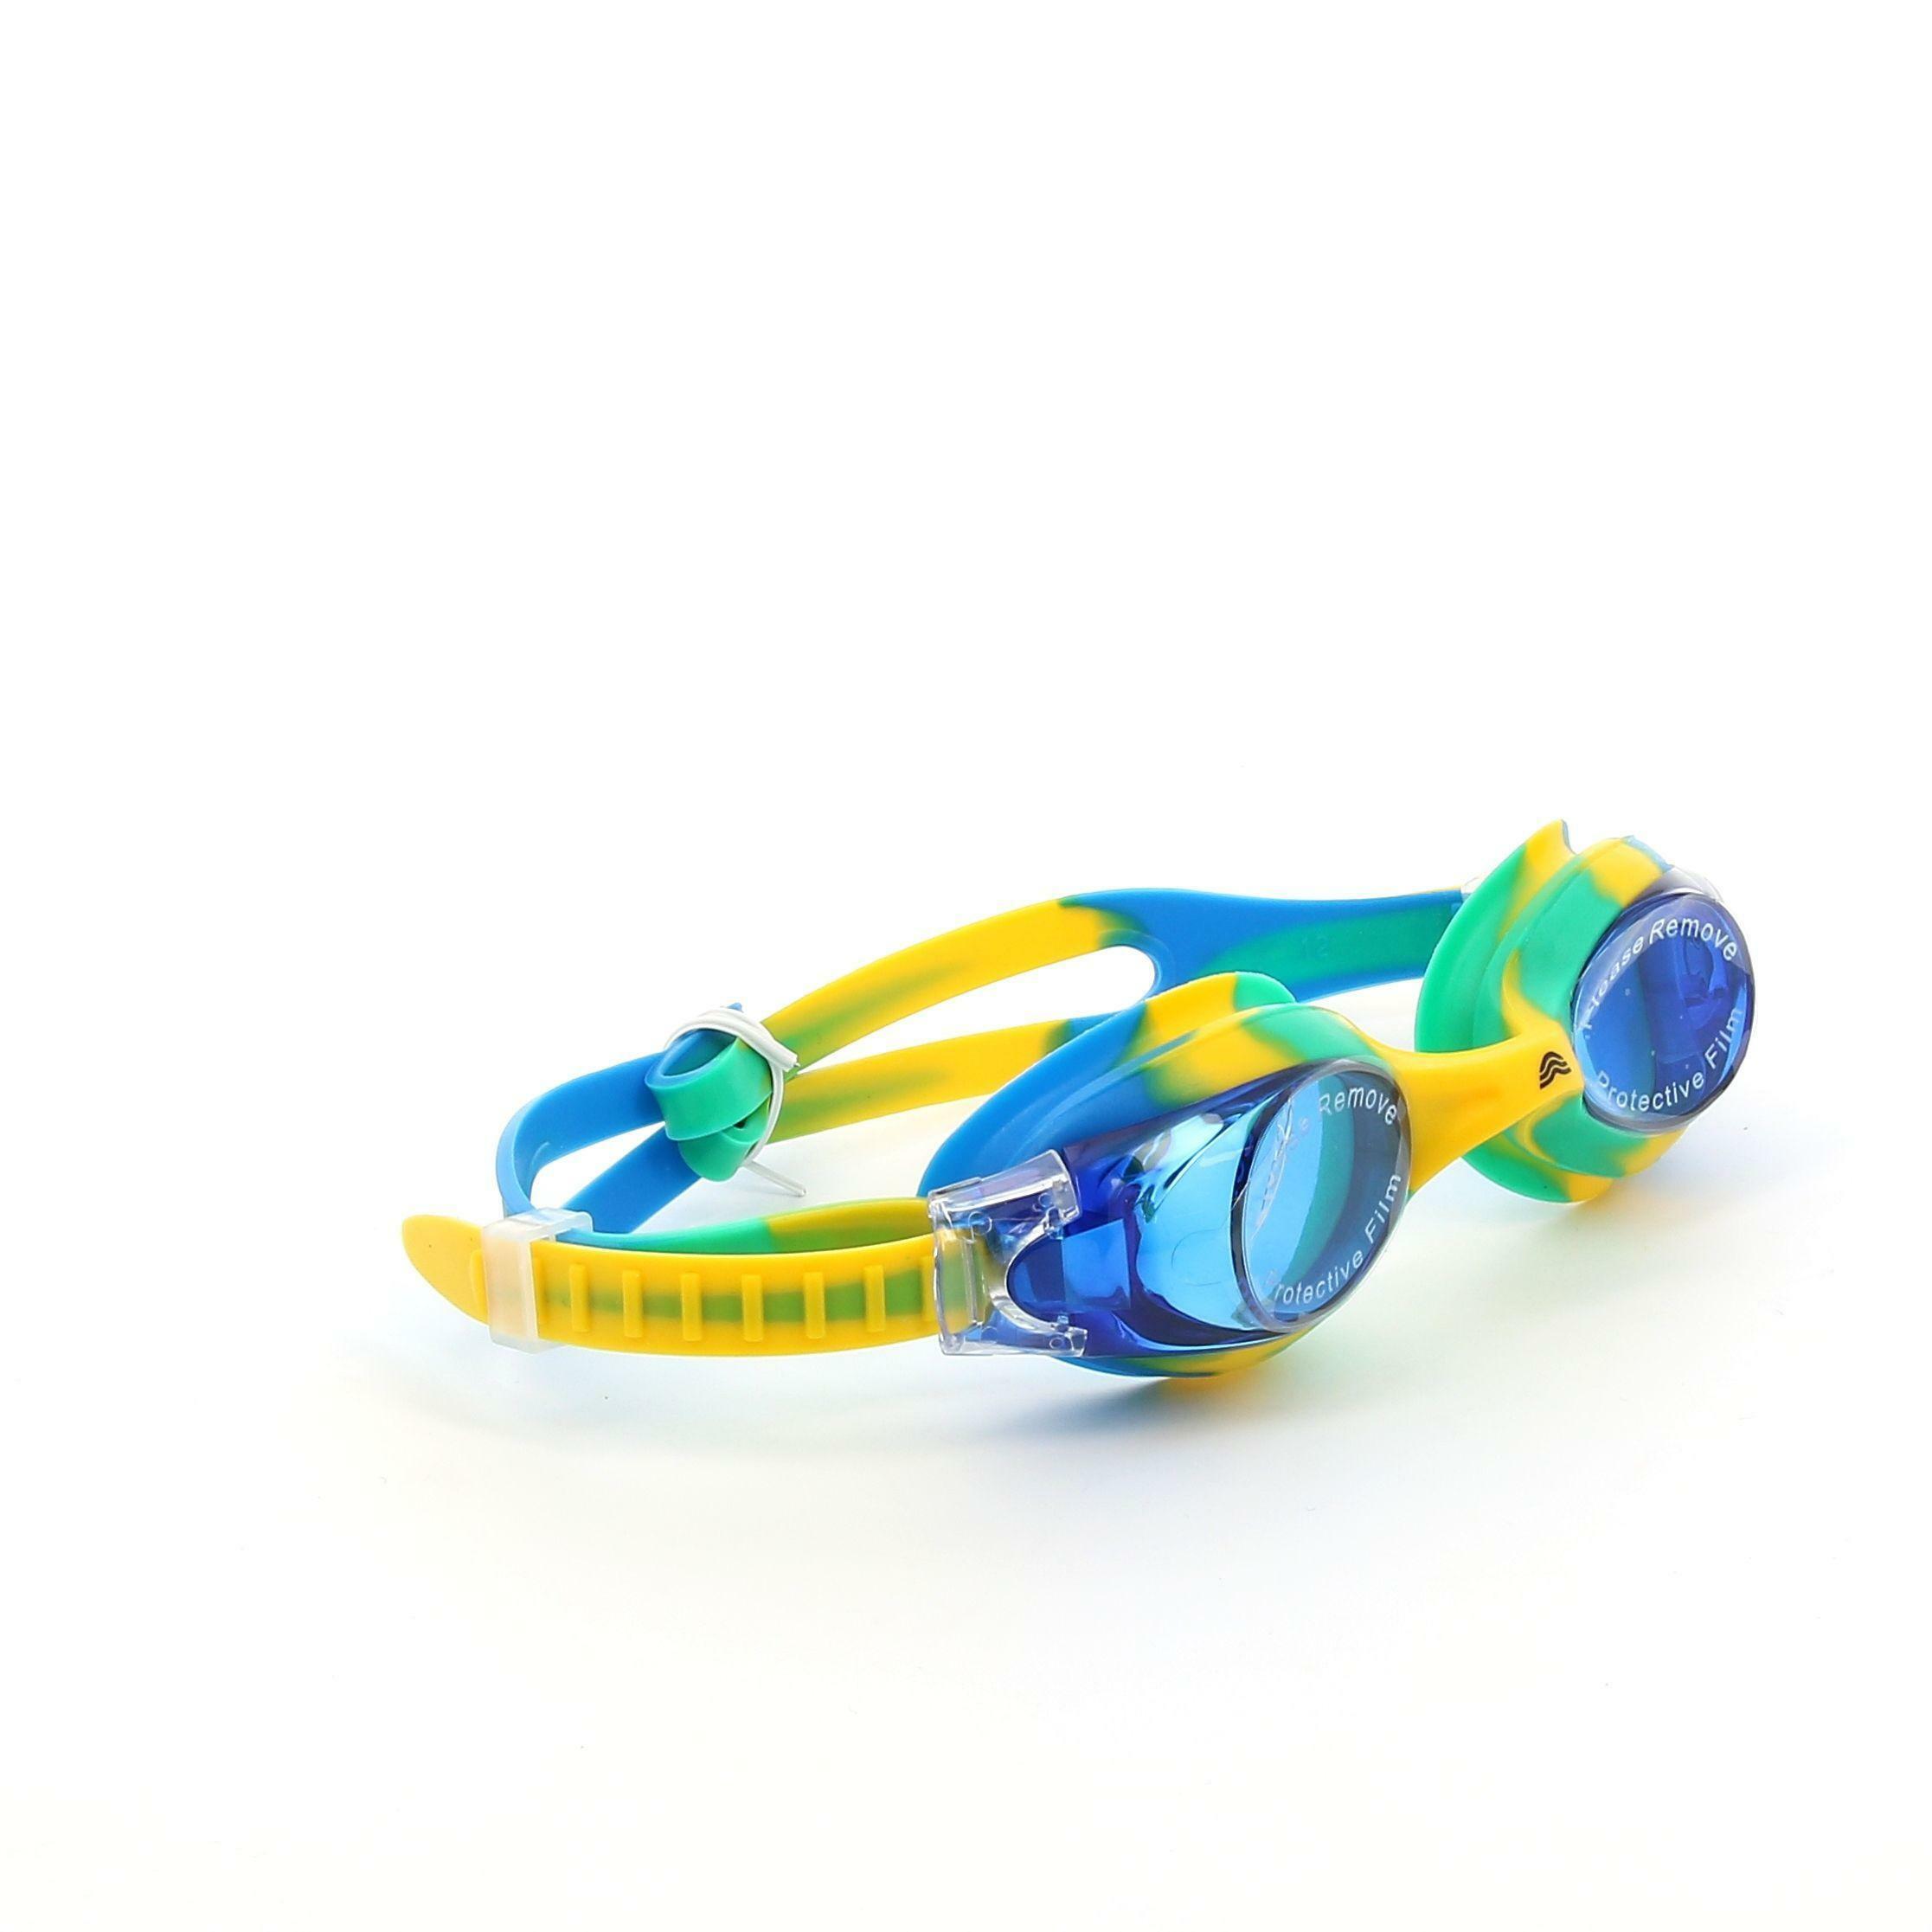 aquarapid aquarapid occhialino swimkid bambino unisex giallo